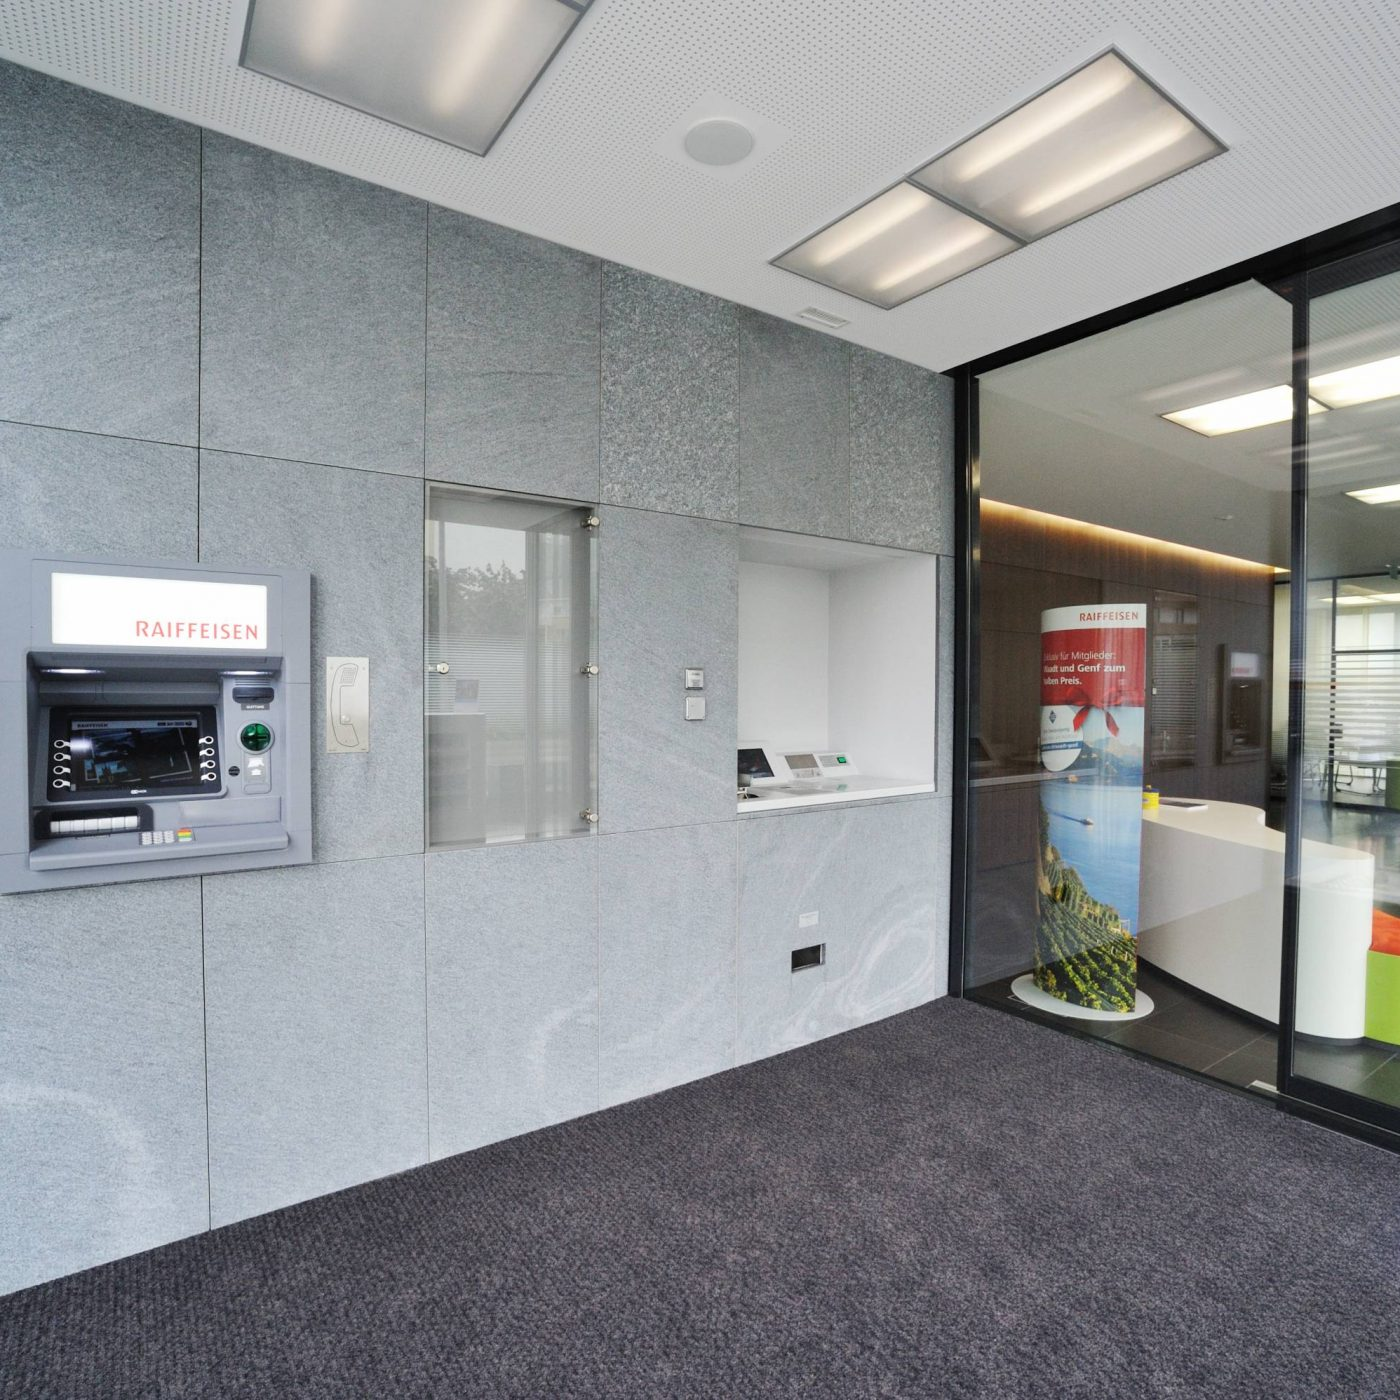 Raiffeisenbank Berneck Au0044